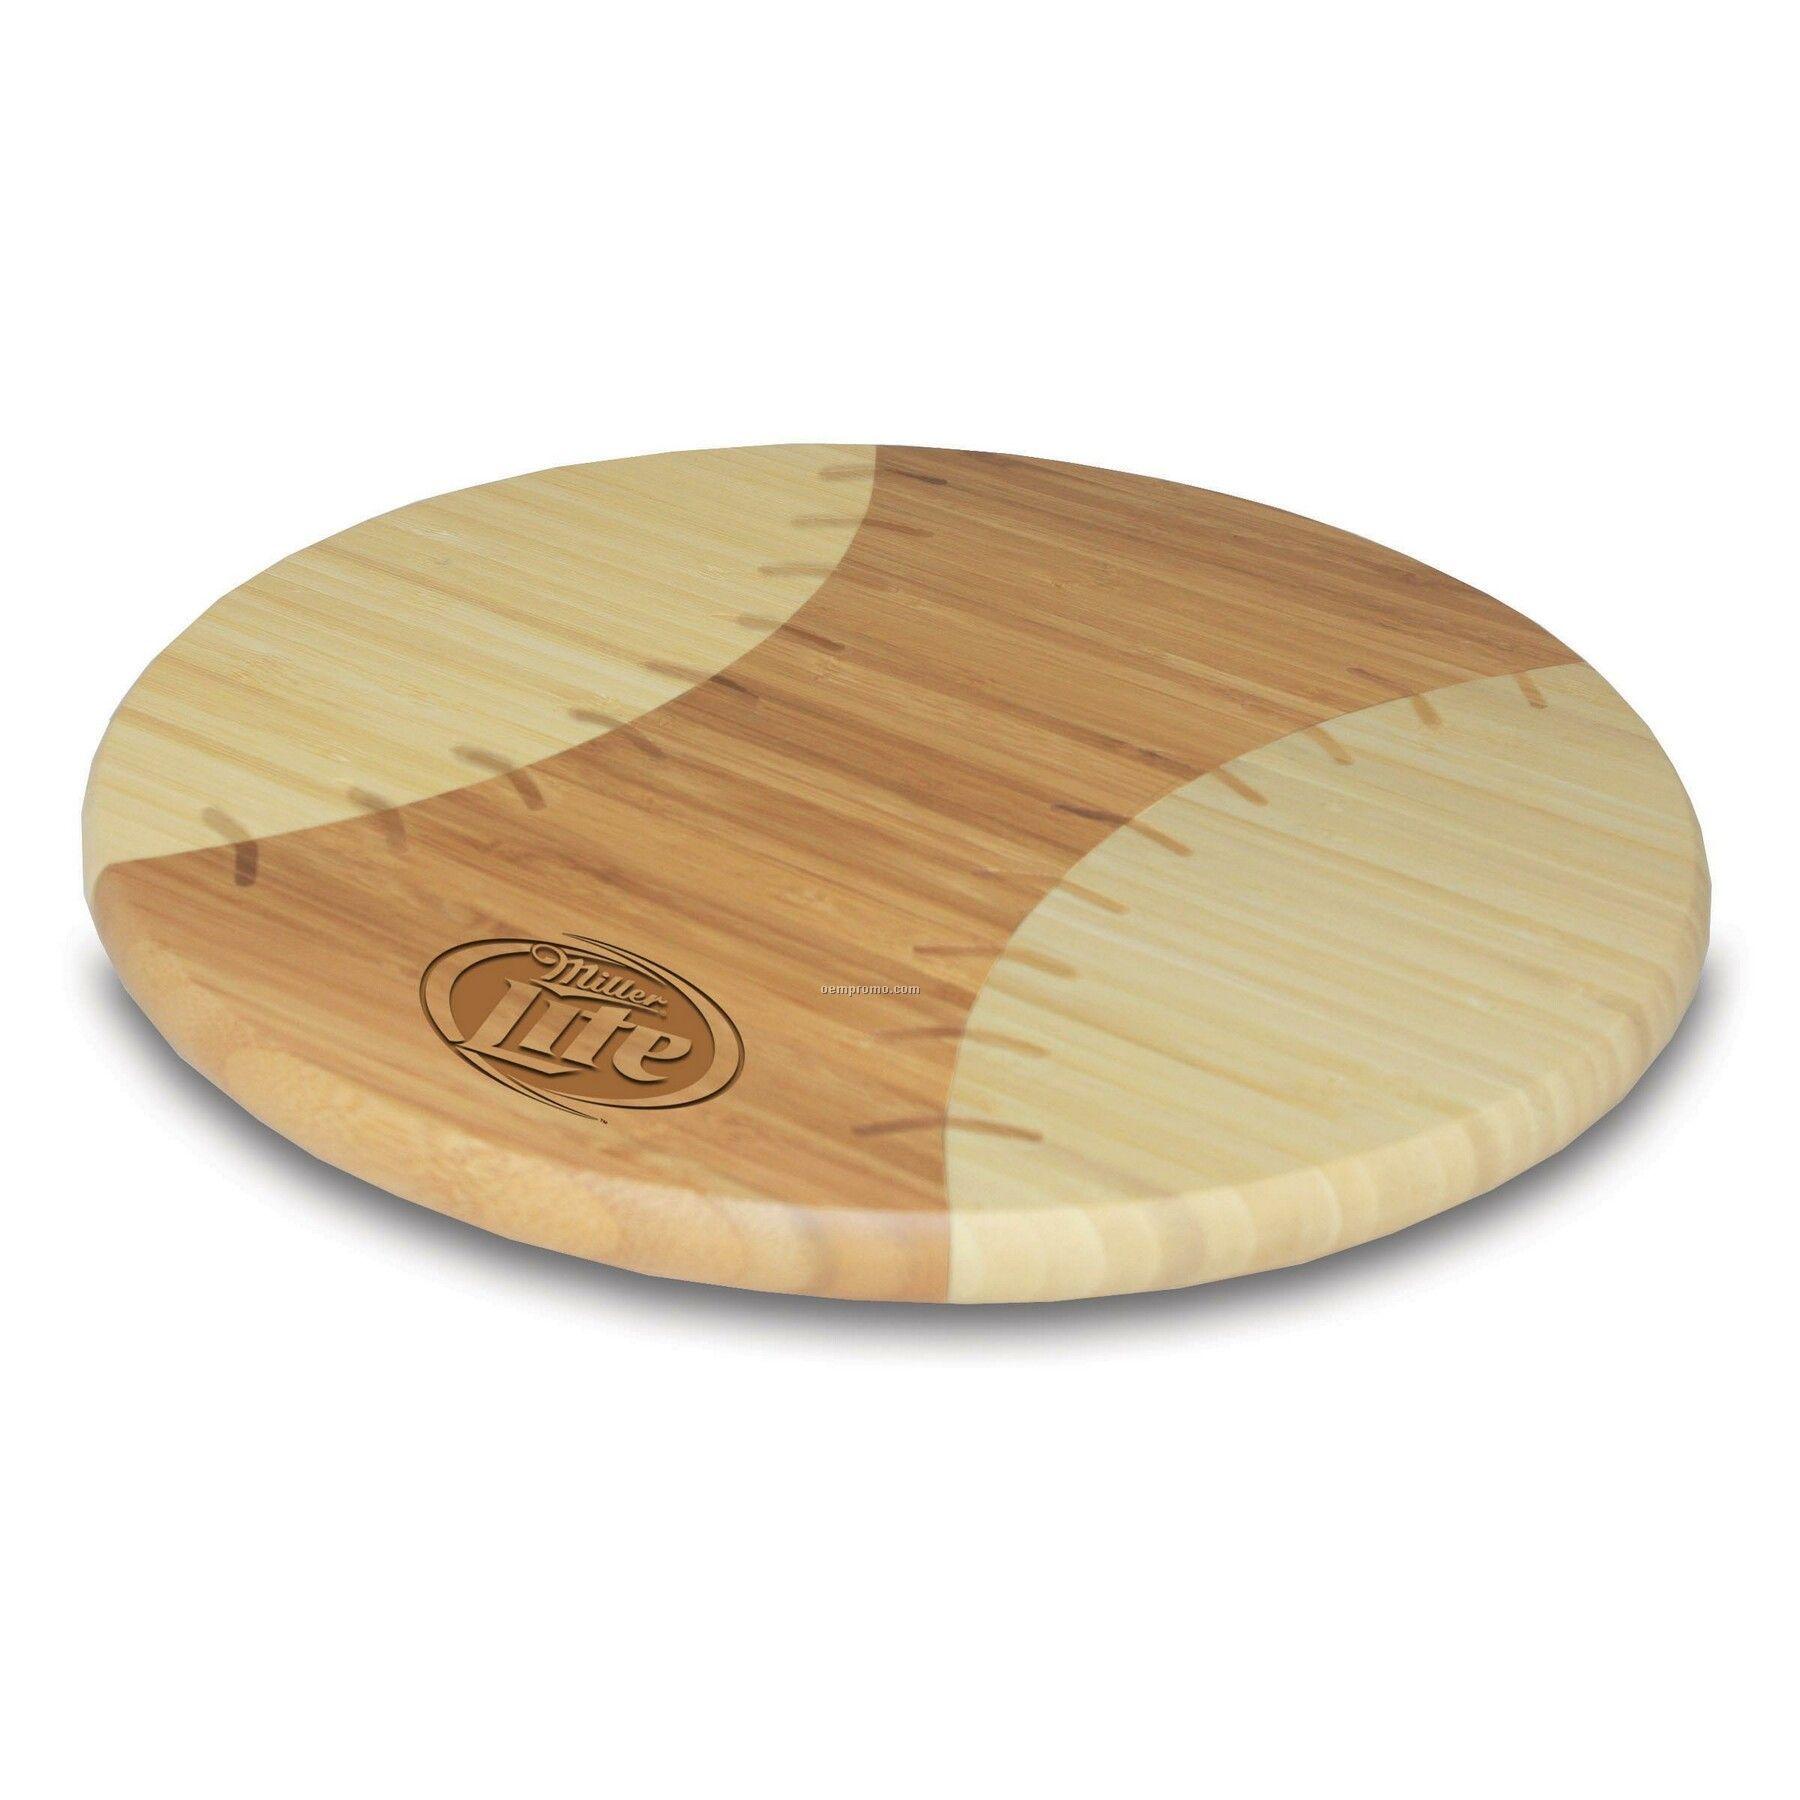 Homerun Baseball Shaped Bamboo Cutting Board / Serving Tray